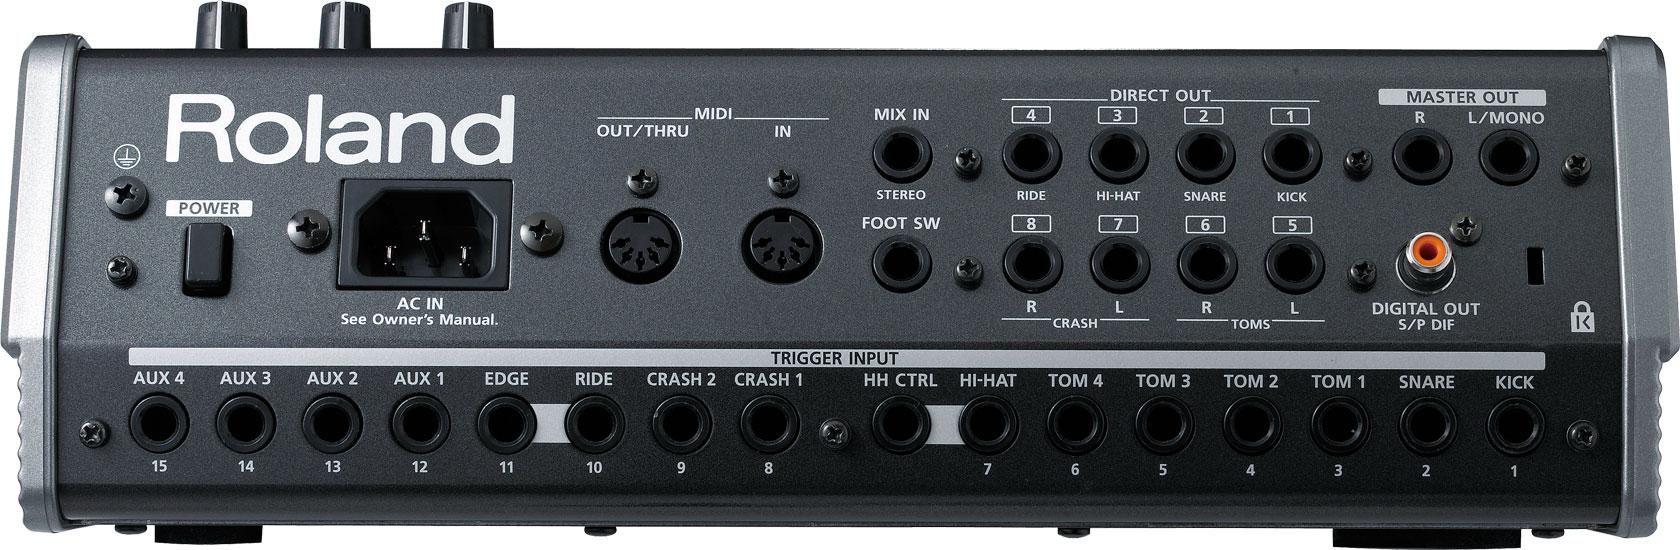 roland td 20x percussion sound module rh roland com roland td-12 manual español roland percussion sound module td-12 manual